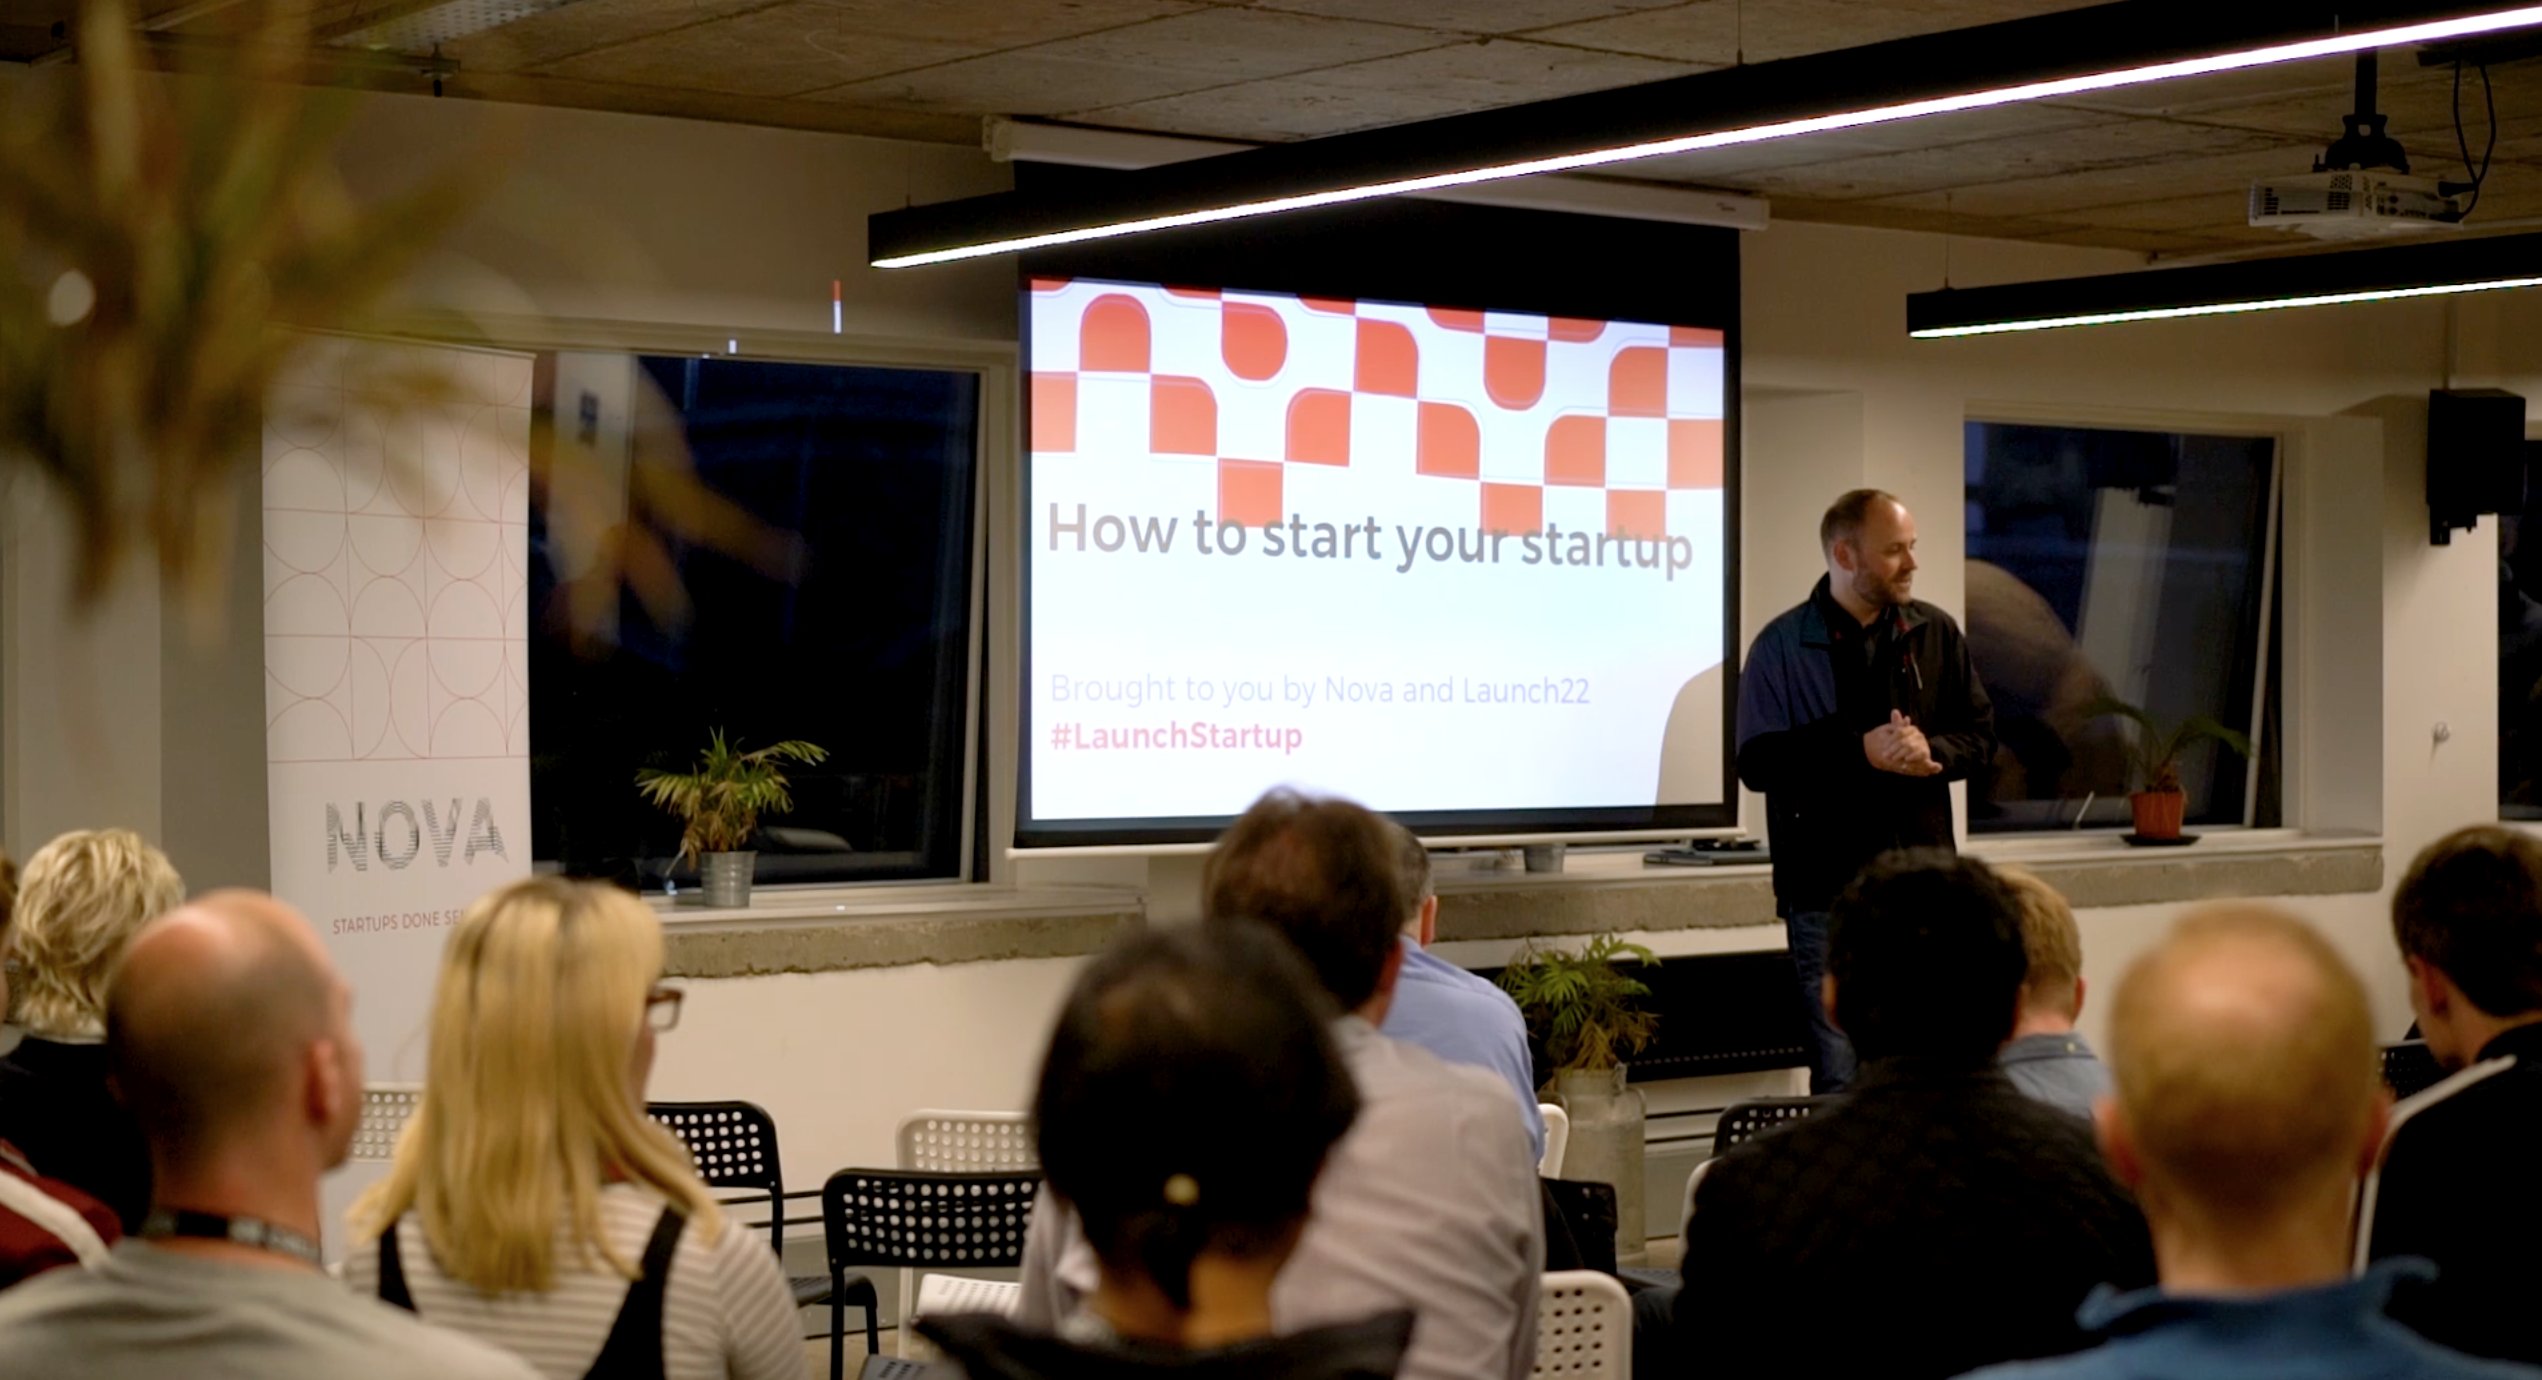 Nova startup school mentoring founders